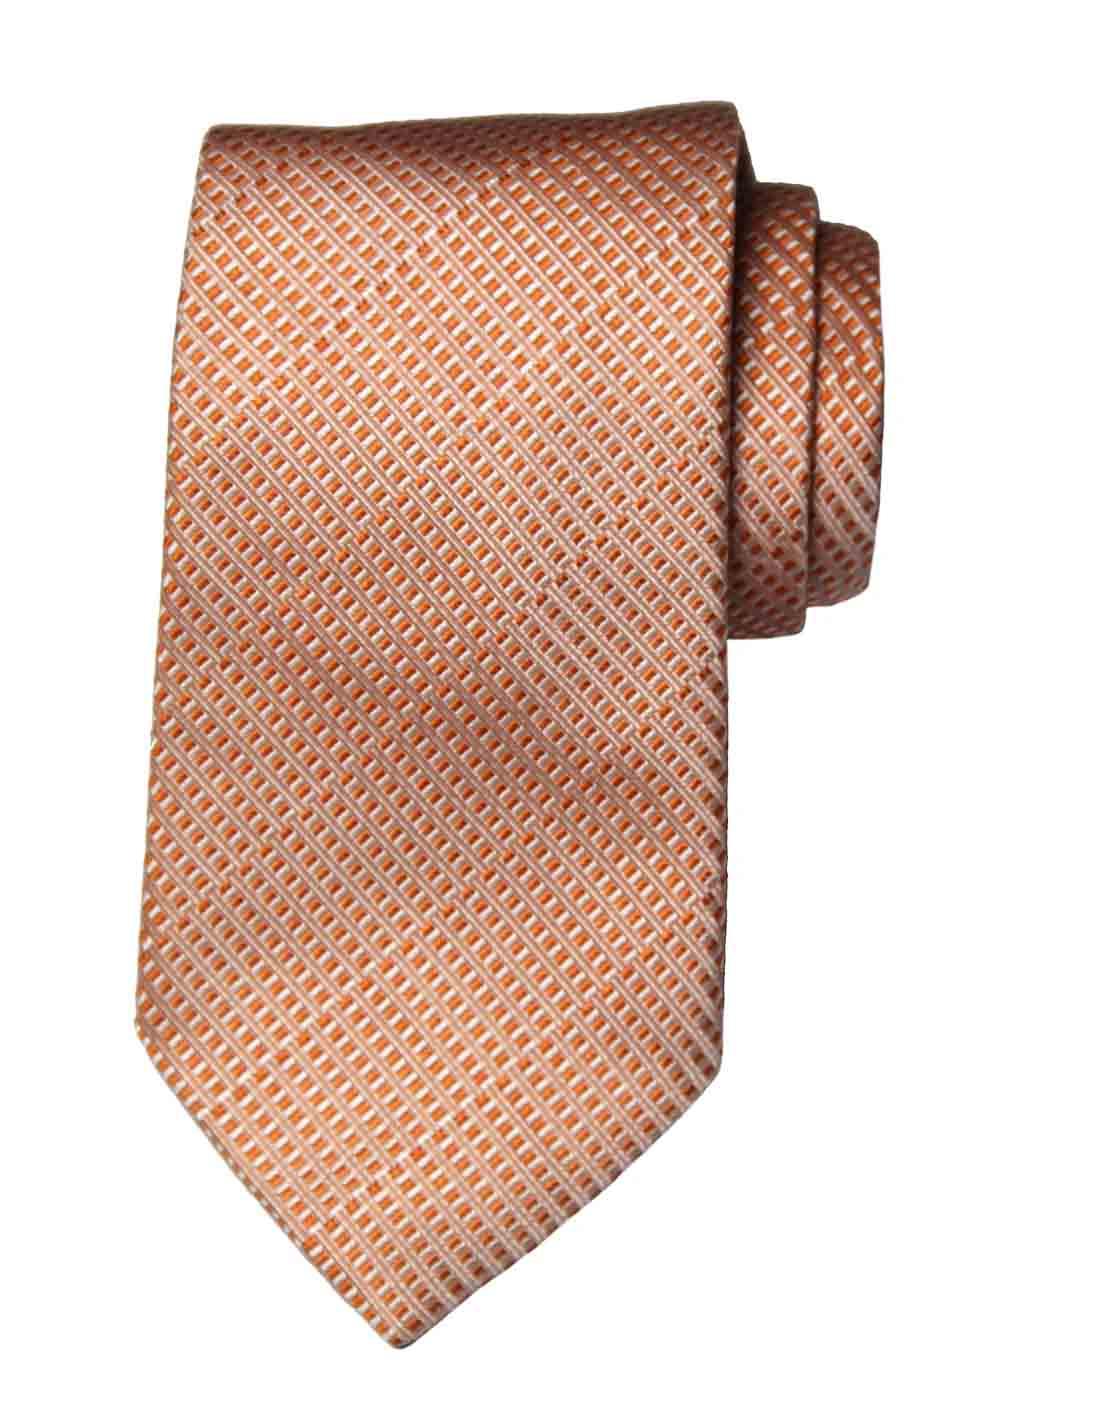 Giorgio Armani Tie Italian Silk Orange White Geometric Men's Long